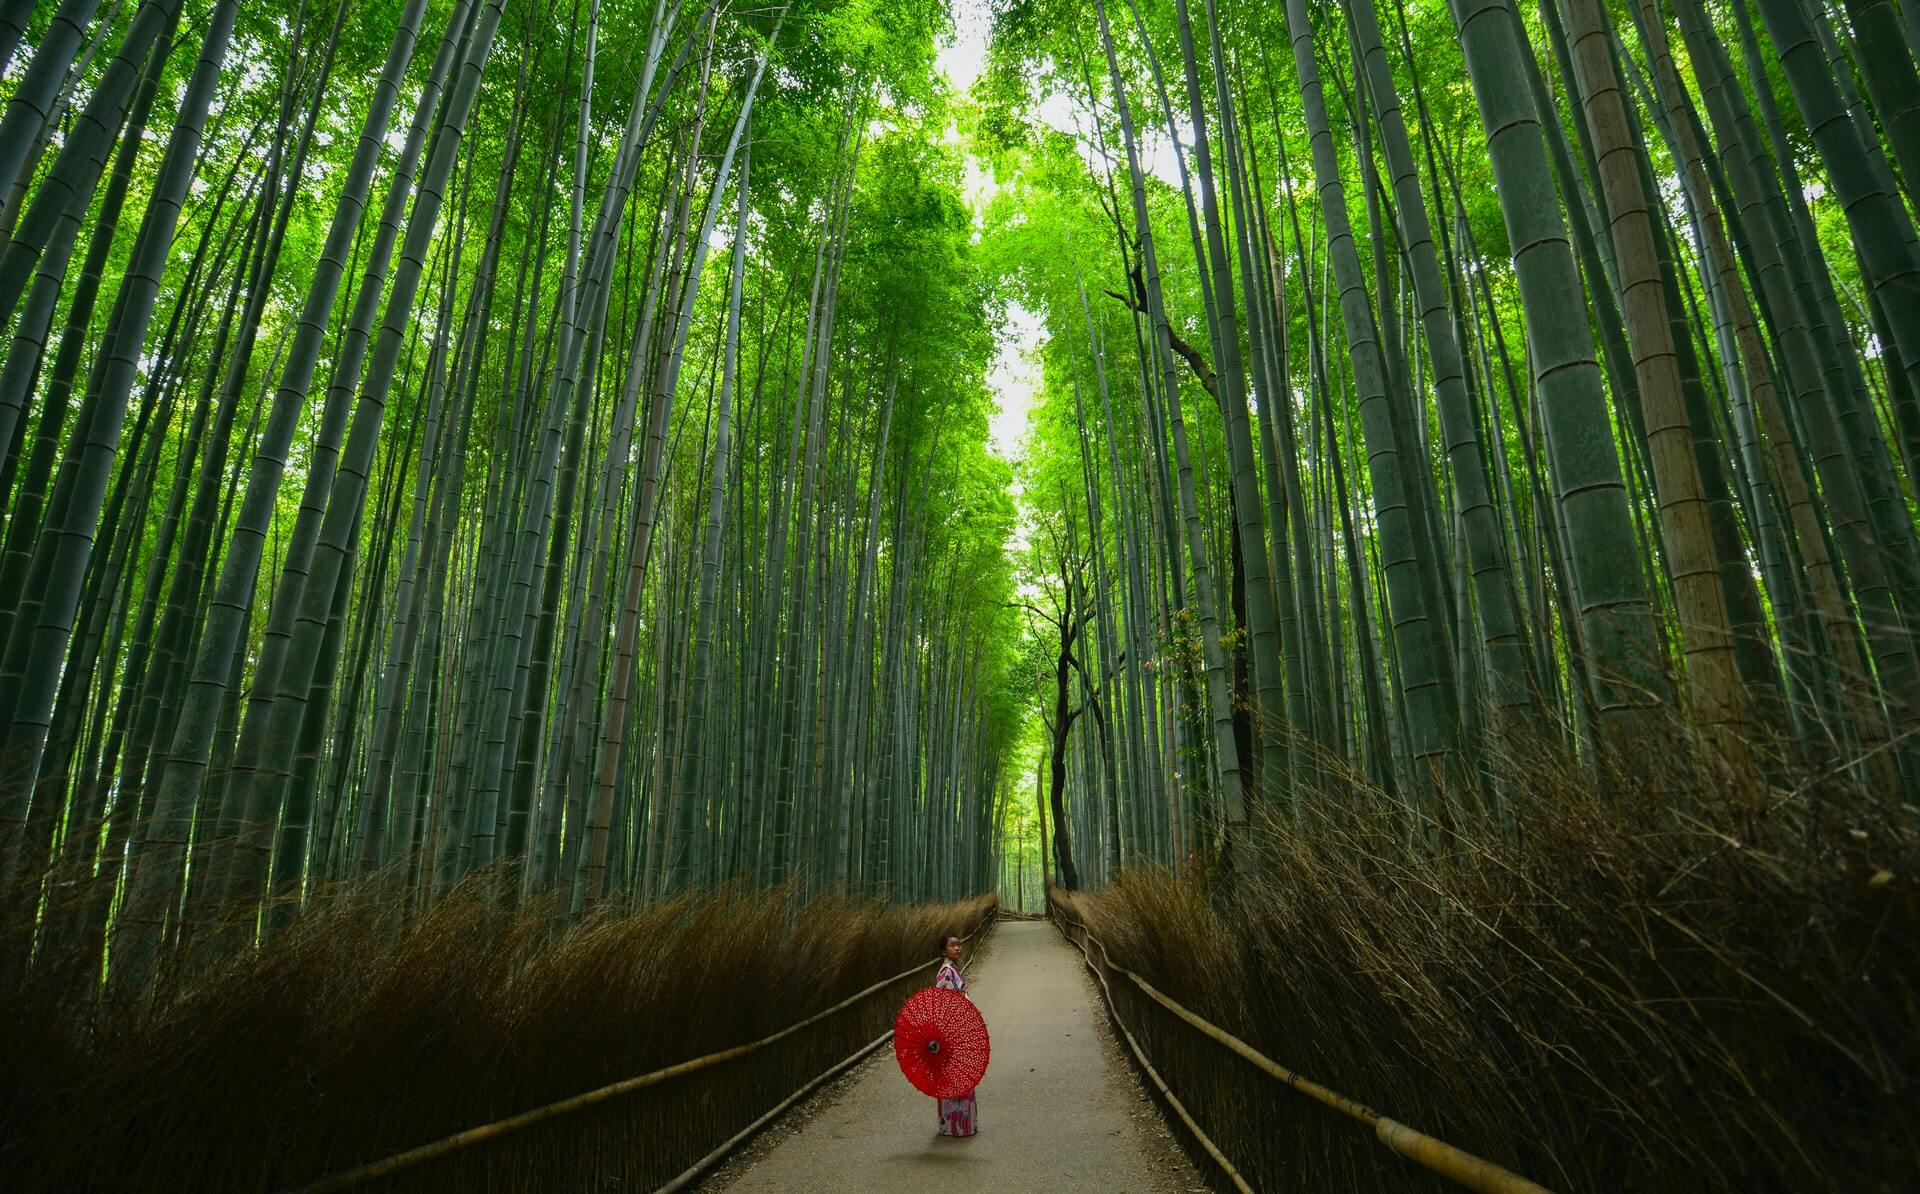 A traveller entering Arashiyama Bamboo Grove, Kyoto - a top sight in Japan to see